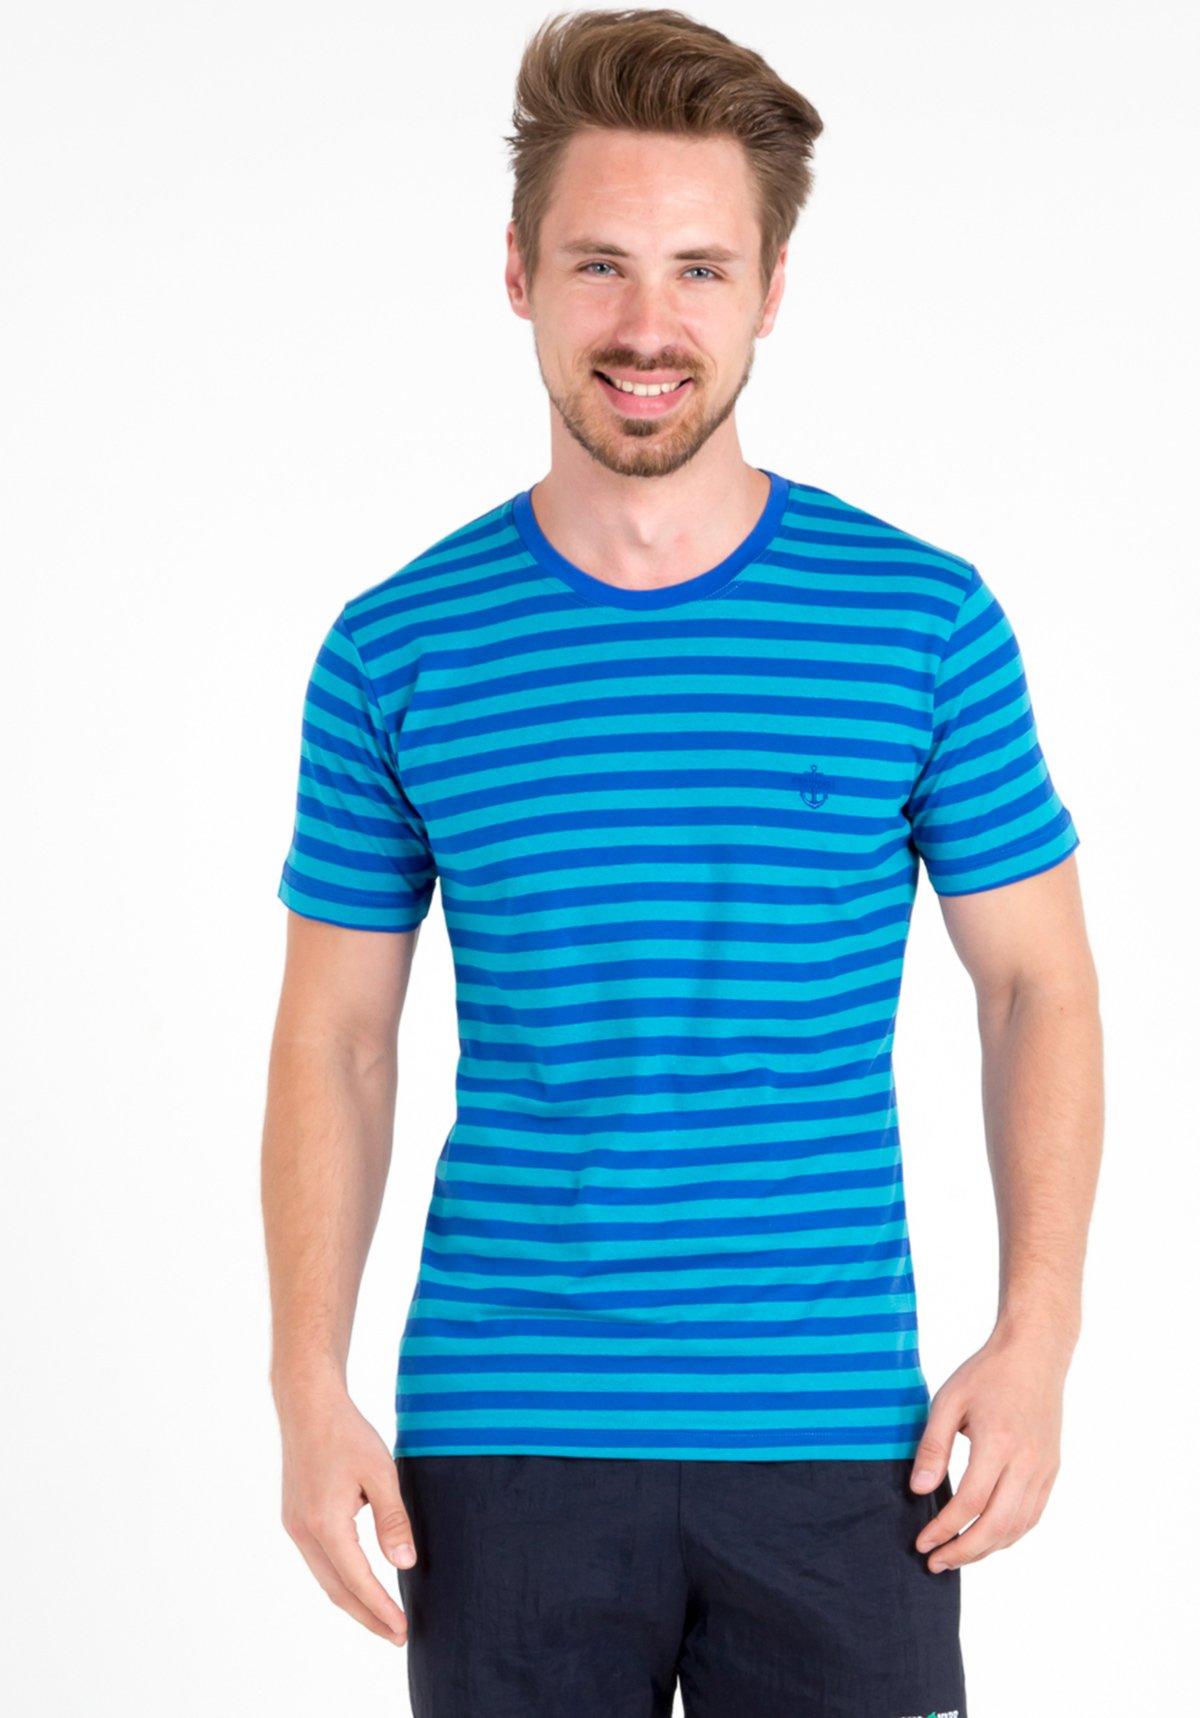 Футболка Breann Цвет: Голубой (52) Ferrucci ferr507540